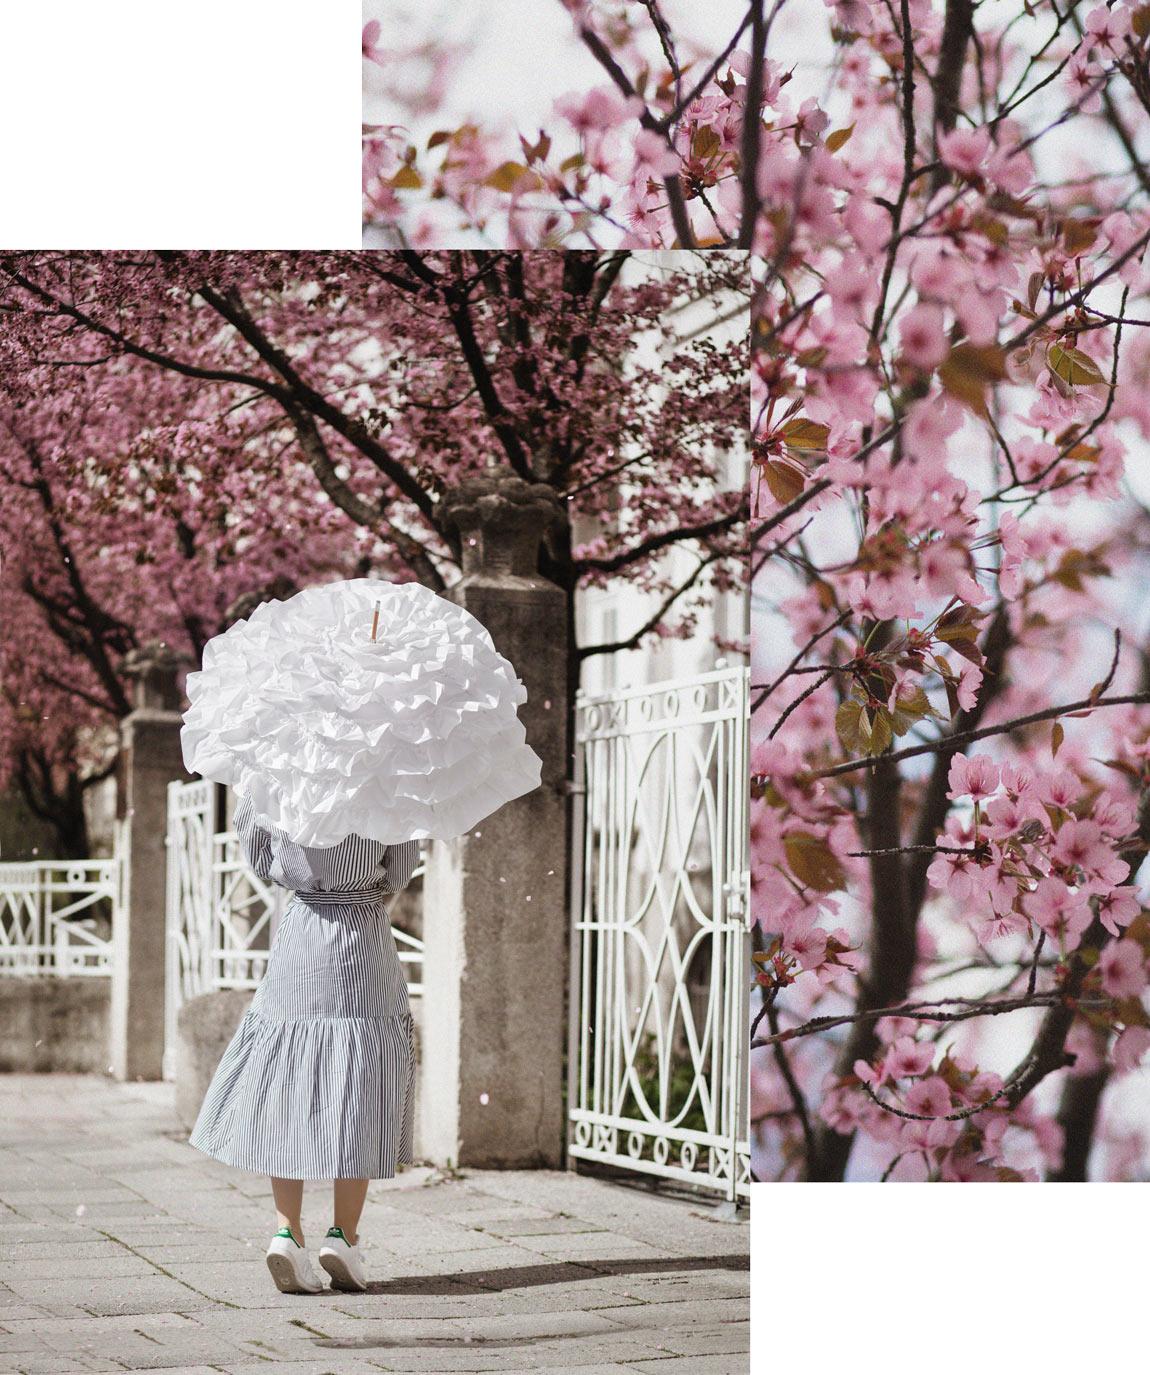 streifen, kirschblüten, zweiteiler, monki, monkistyle, midi, rock, streetstyle, romantik, muenchen, rot, barrett, fashionblogger, modeblogger, modeblog, outfit, inspiration